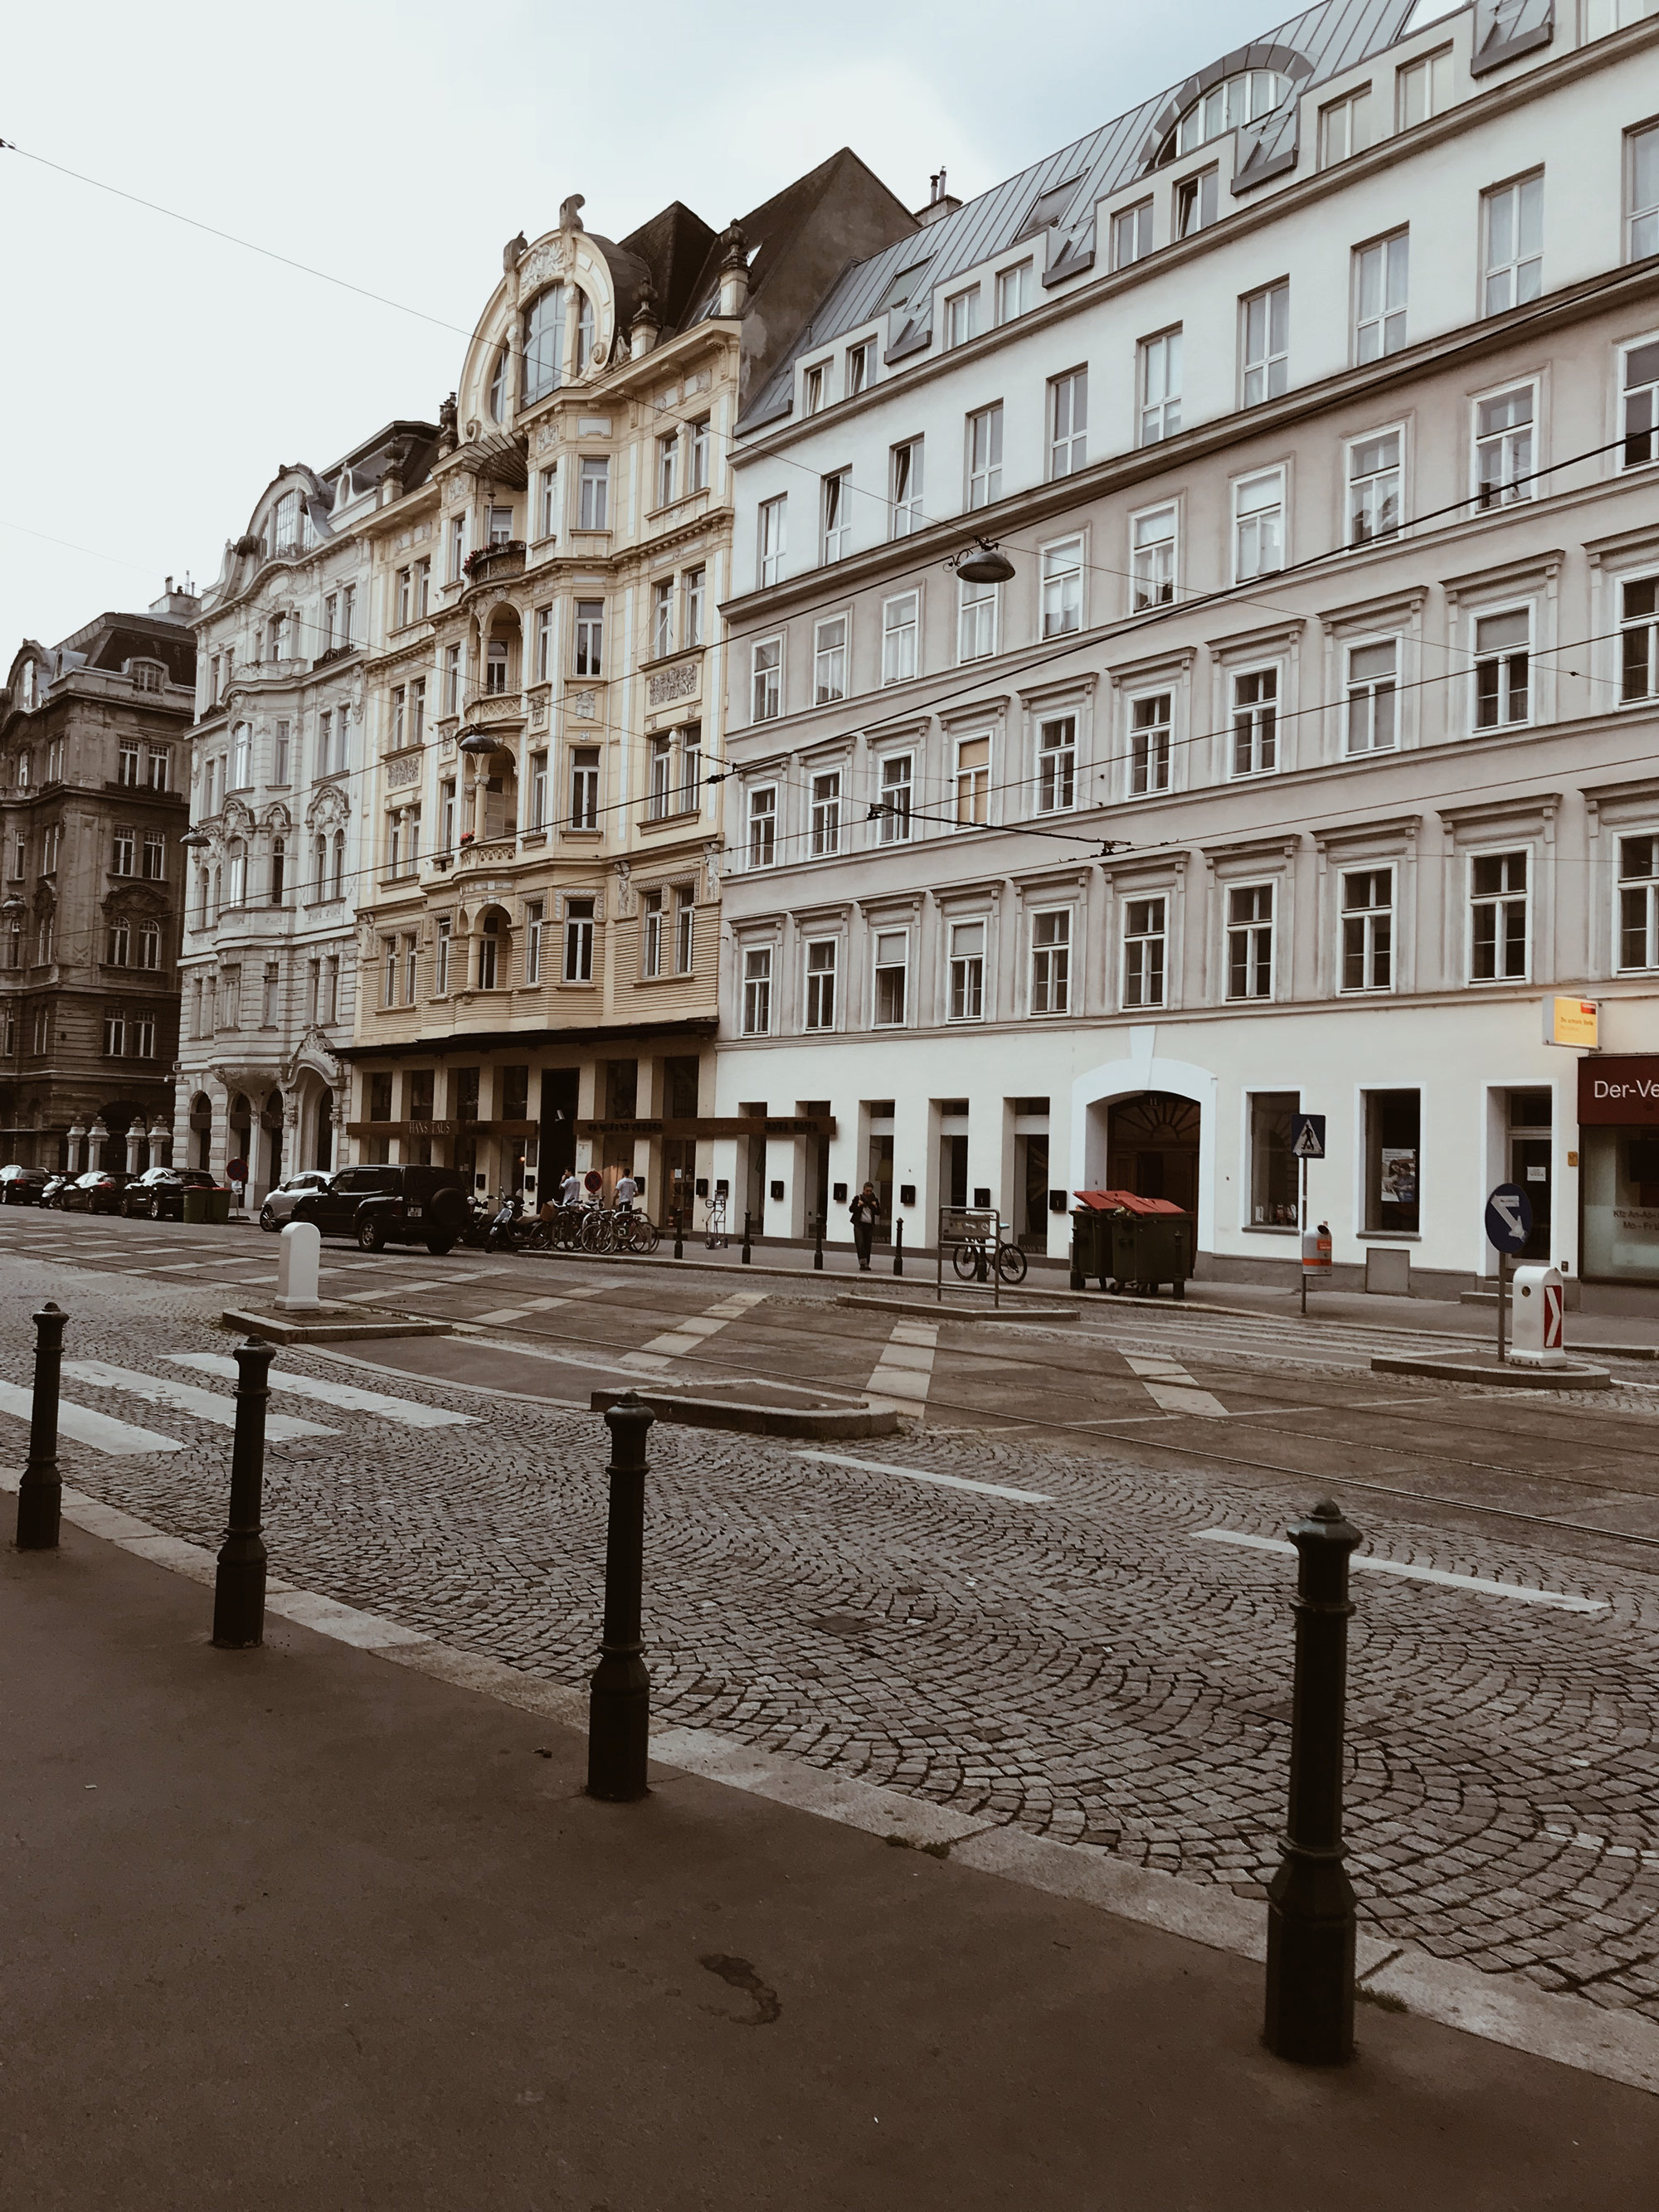 Umzugsfirma in Wien - www.lesfactoryfemmes.com